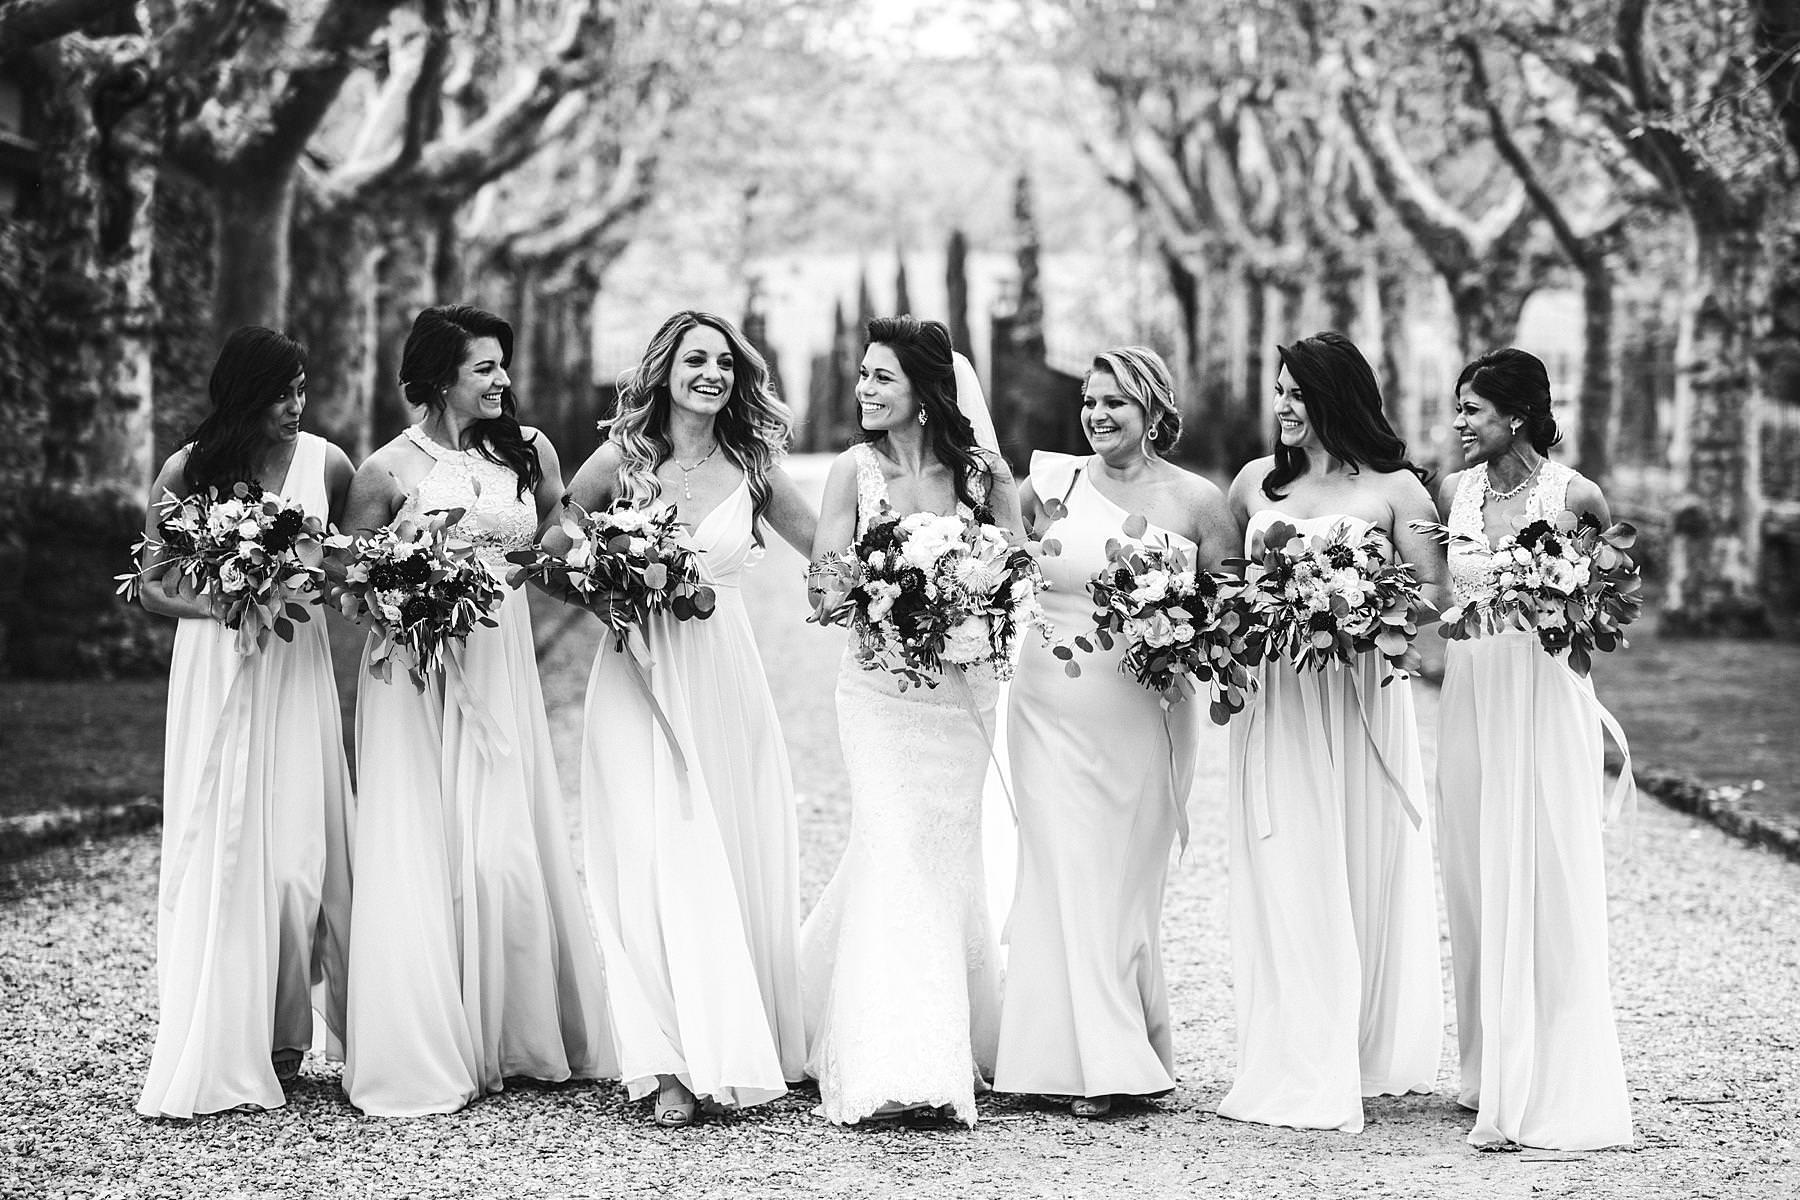 Bride in Pronovias wedding gown and bridesmaids photo. Elegant destination wedding in Tuscany at historic venue of Villa La Selva Wine Resort